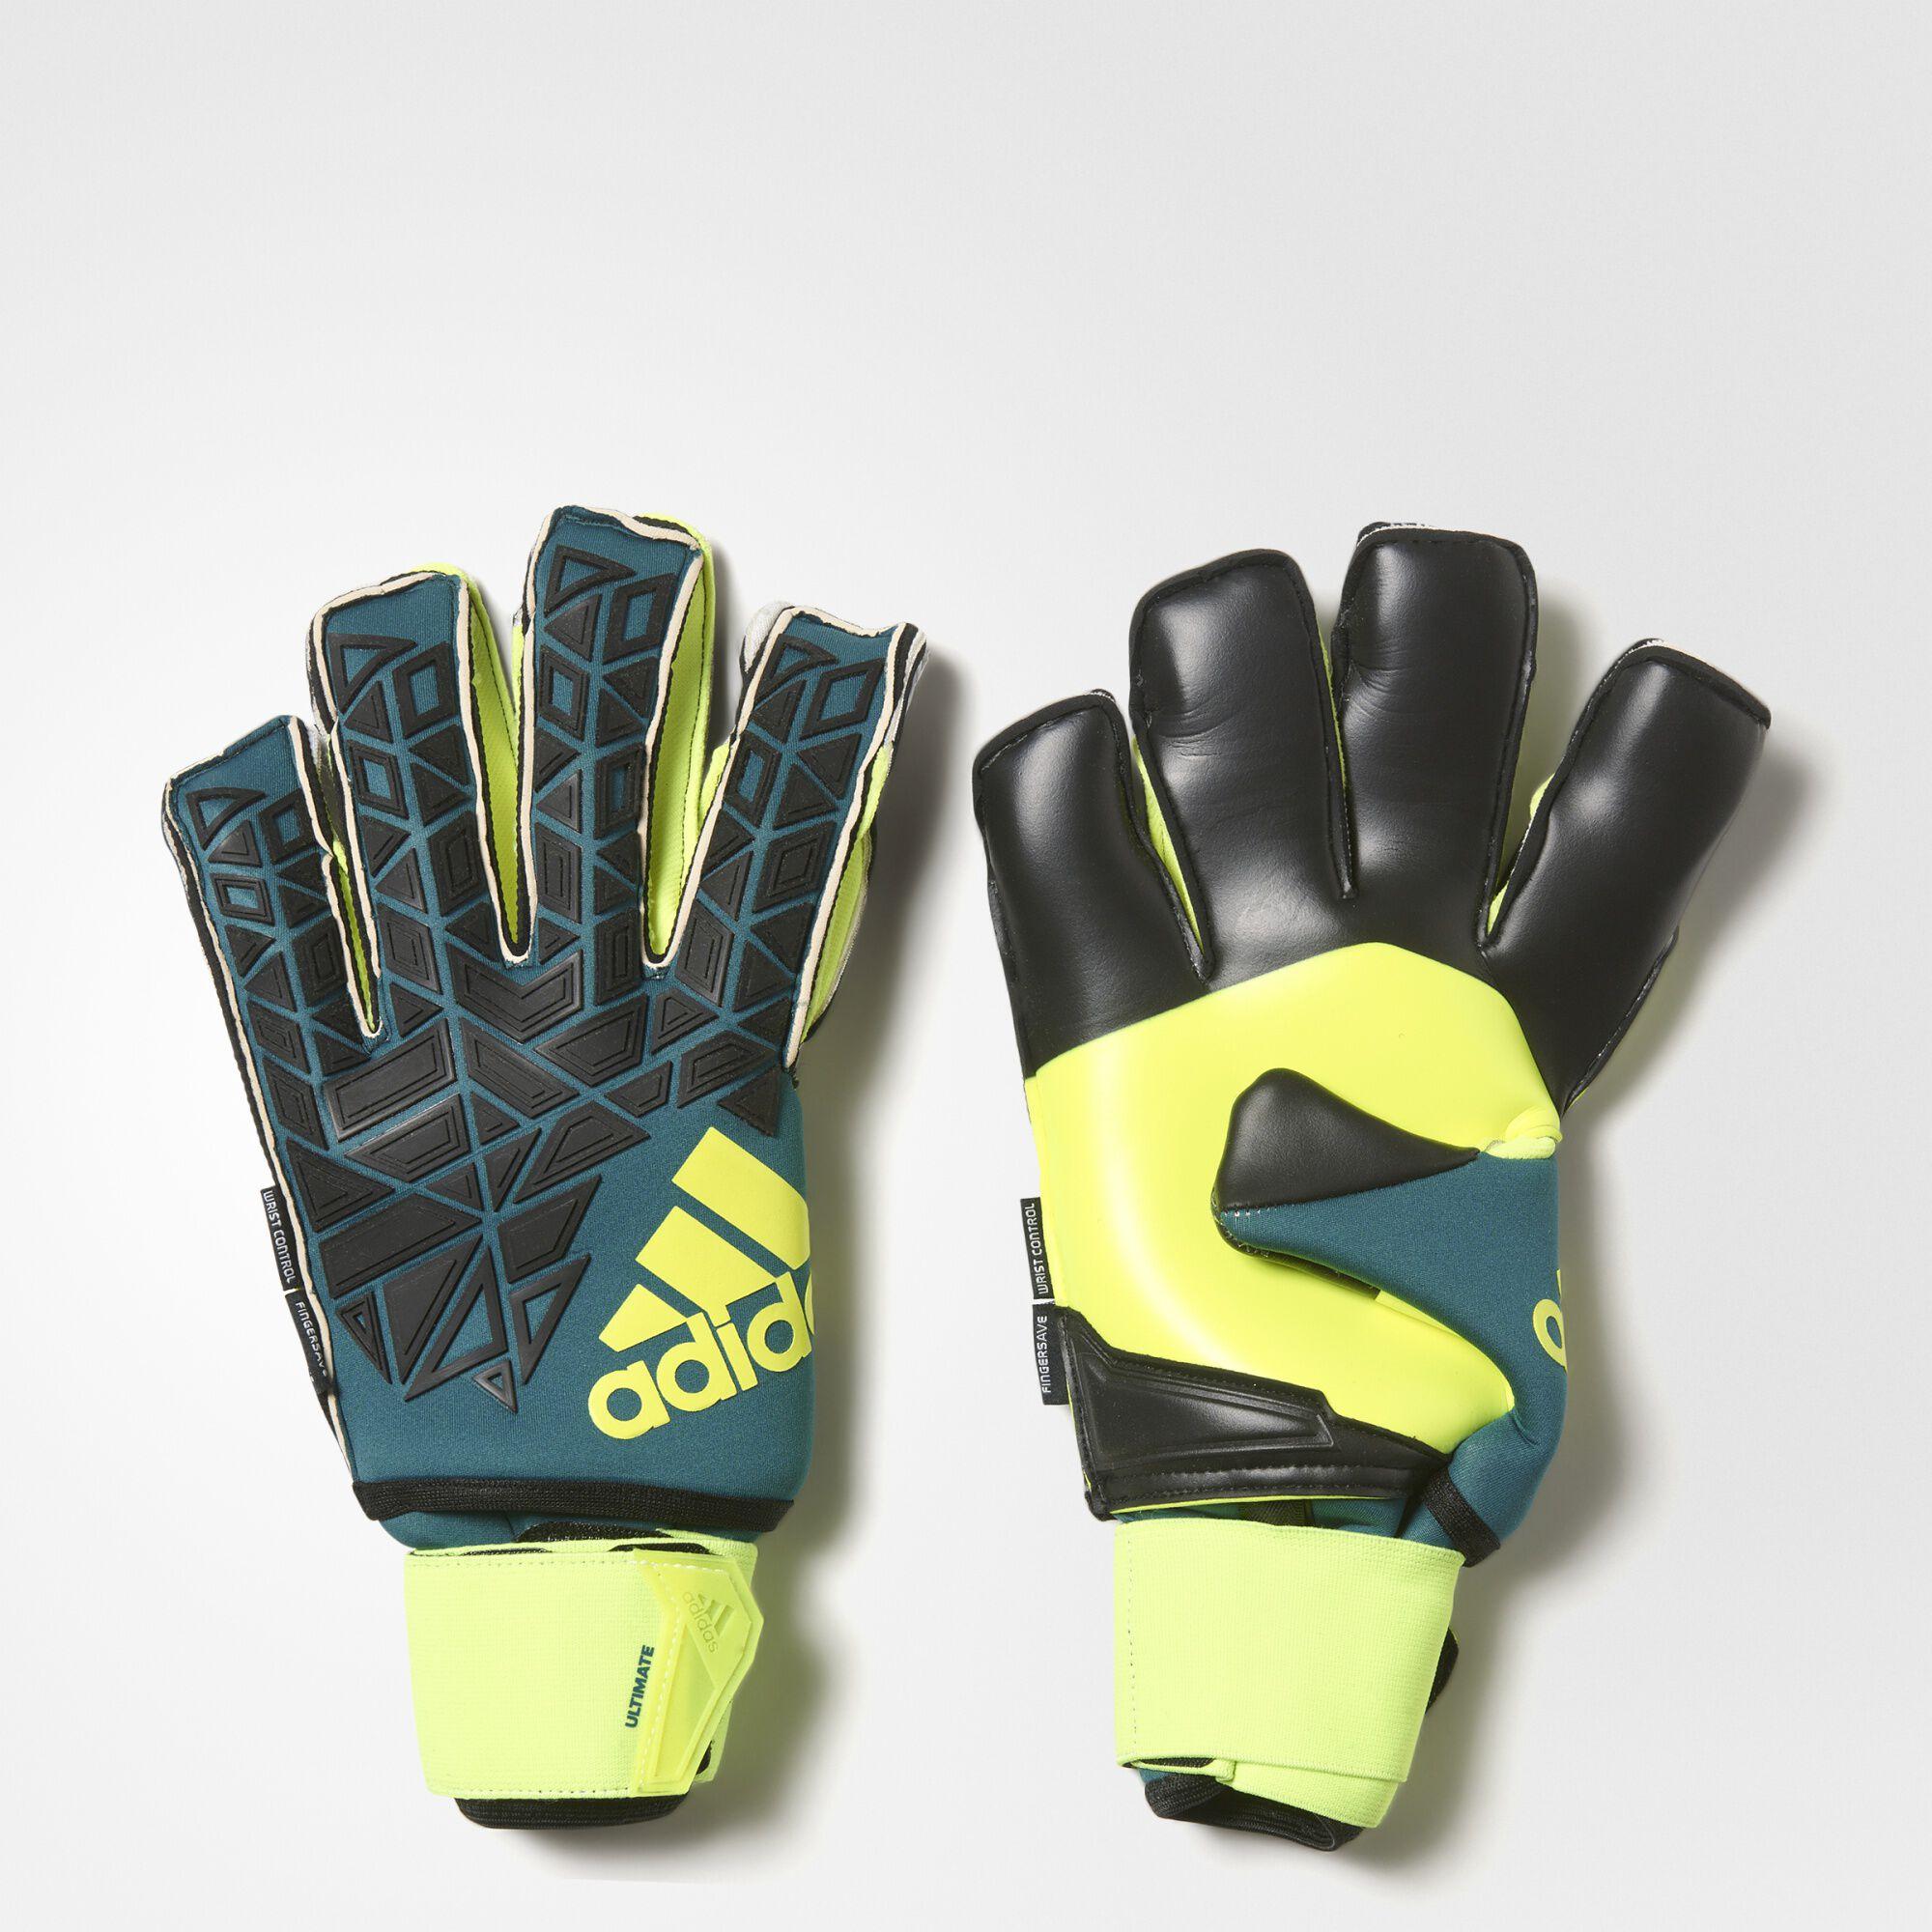 Adidas X Ace